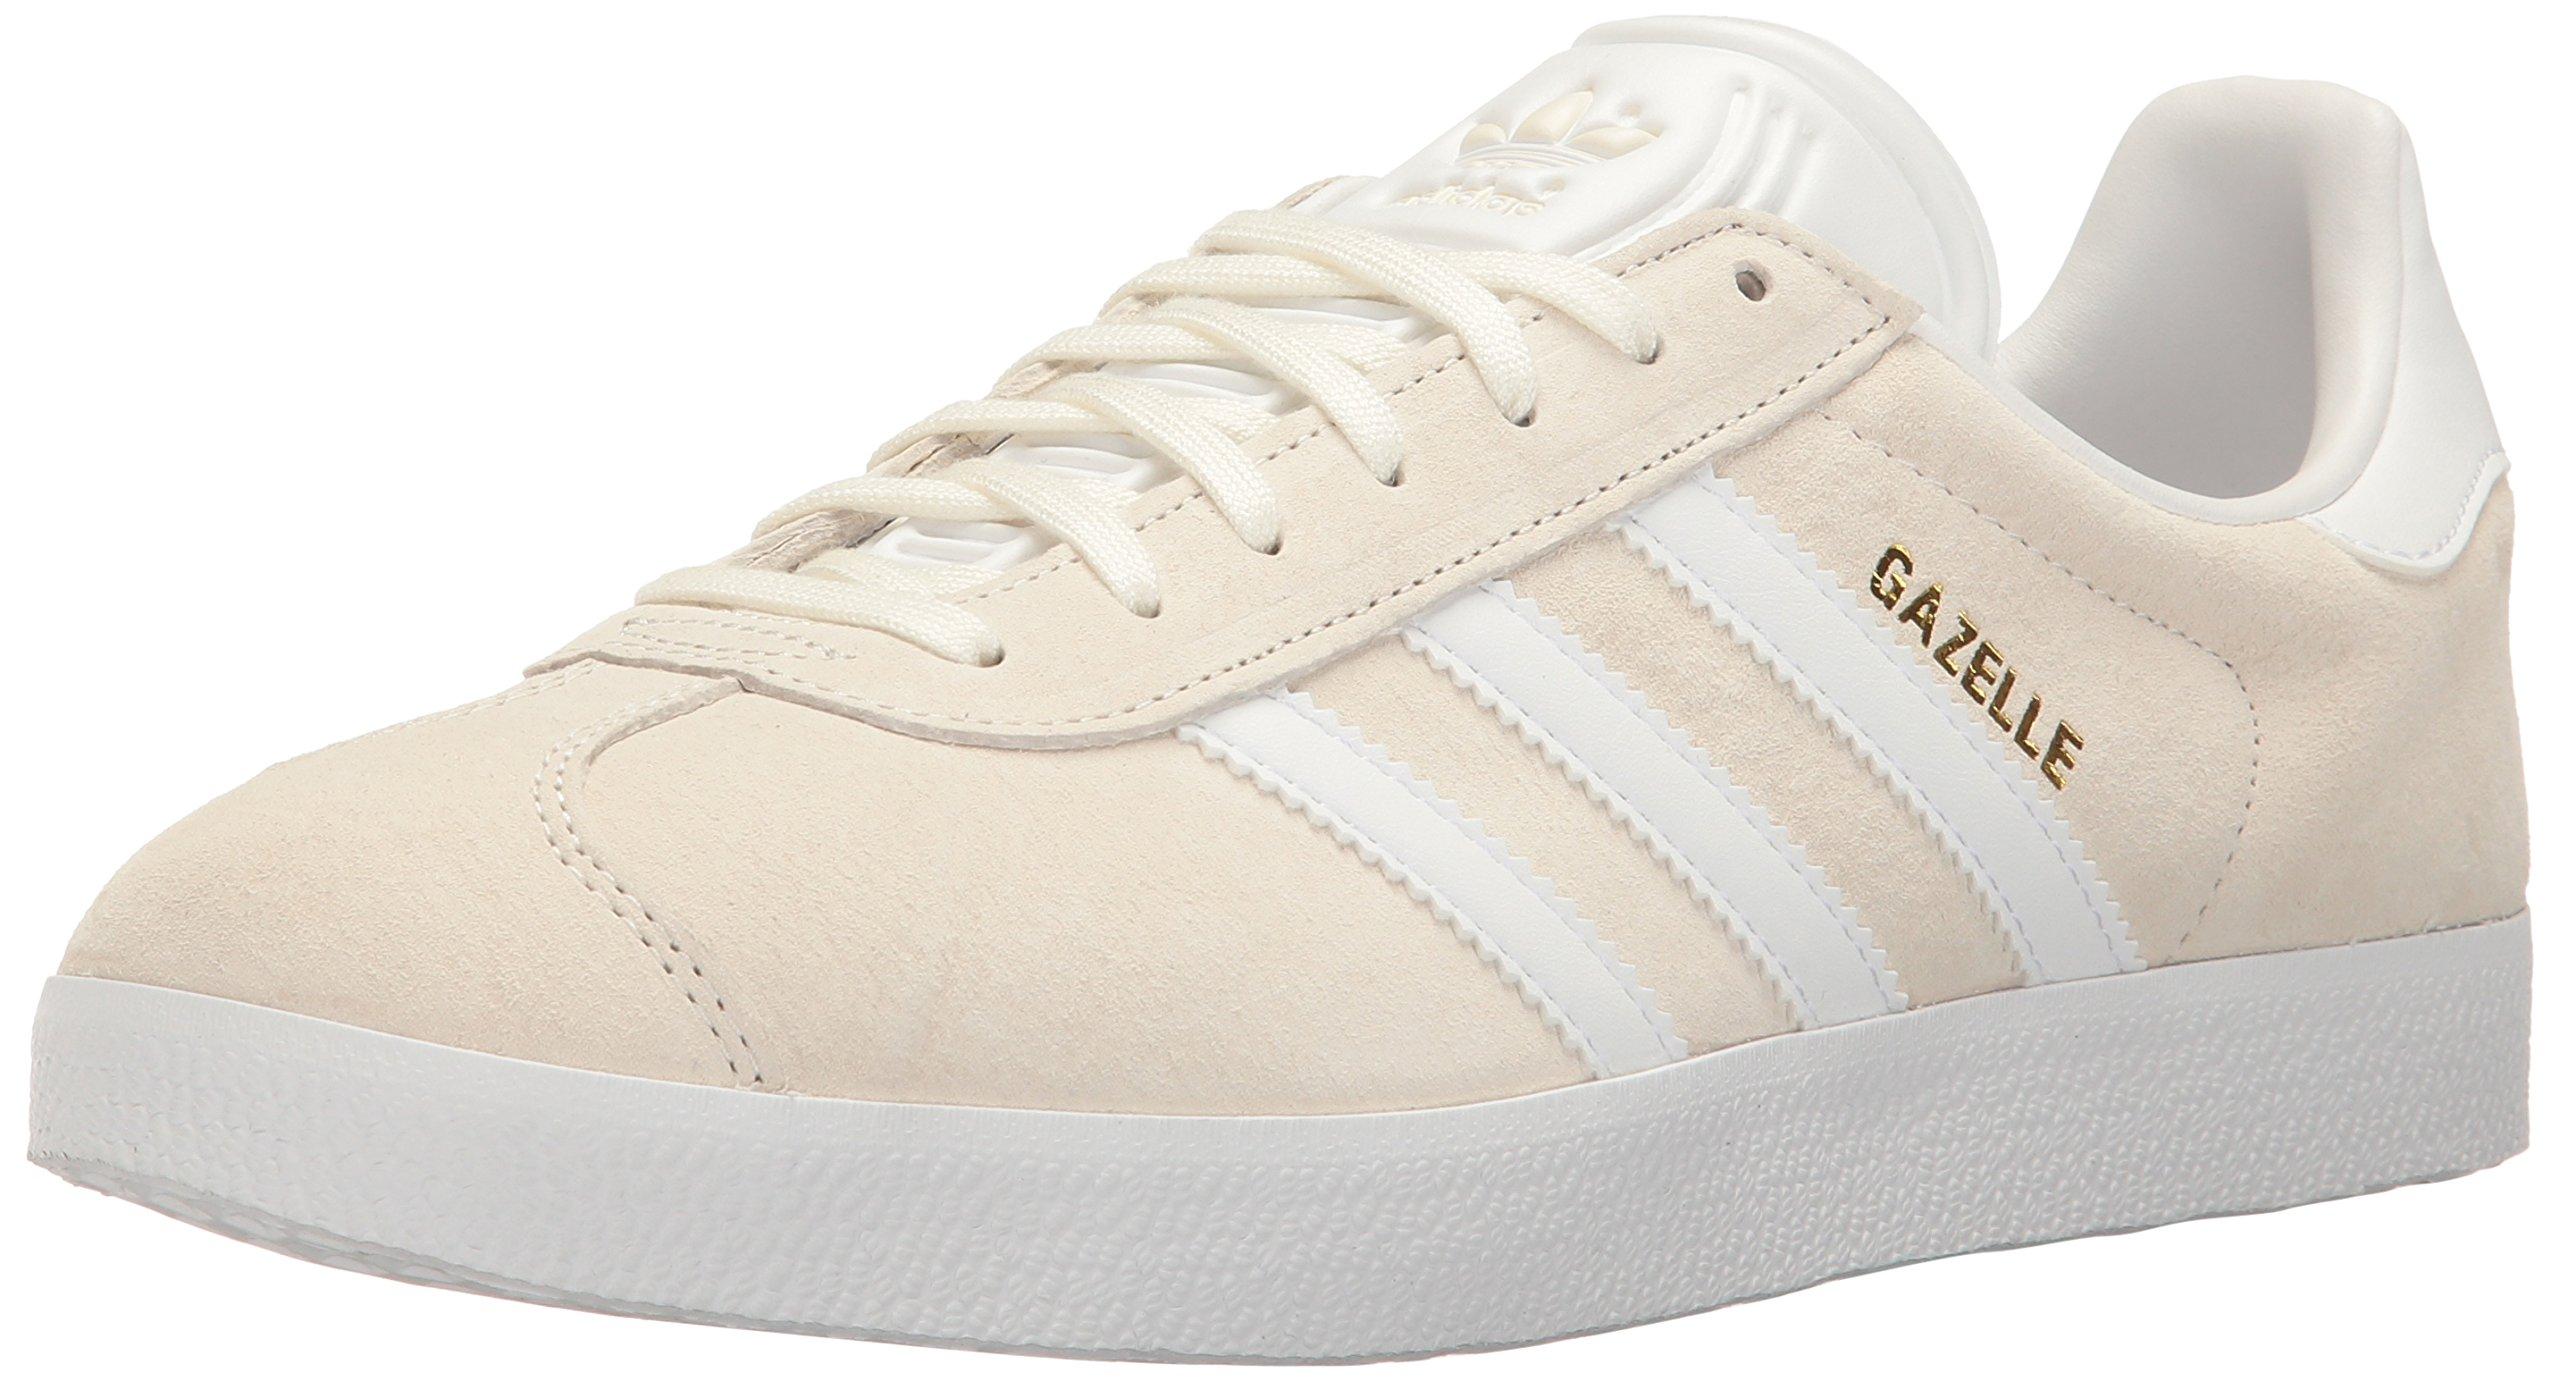 online store 29574 84487 Galleon - Adidas Originals Women s Shoes   Gazelle Sneakers, White Metallic  Gold, (5.5 M US)